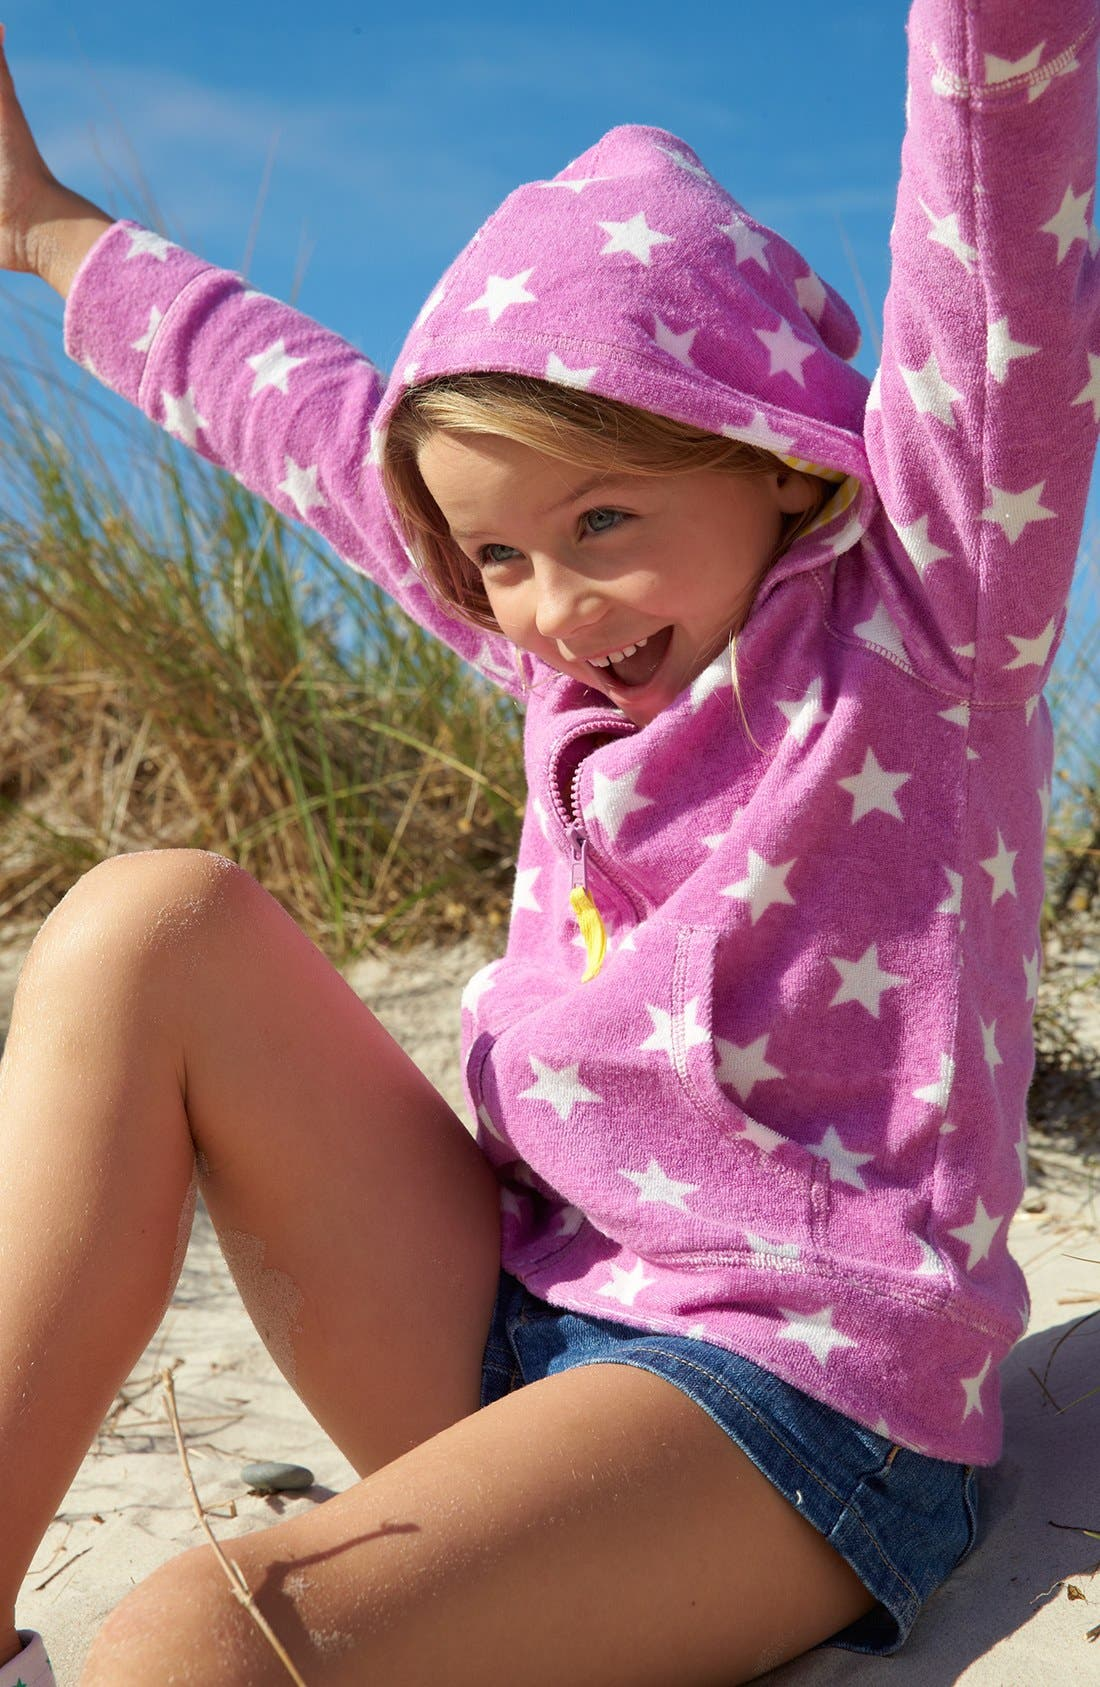 Alternate Image 2  - Mini Boden 'Towelling' Hoodie (Toddler Girls, Little Girls & Big Girls)(Online Only)